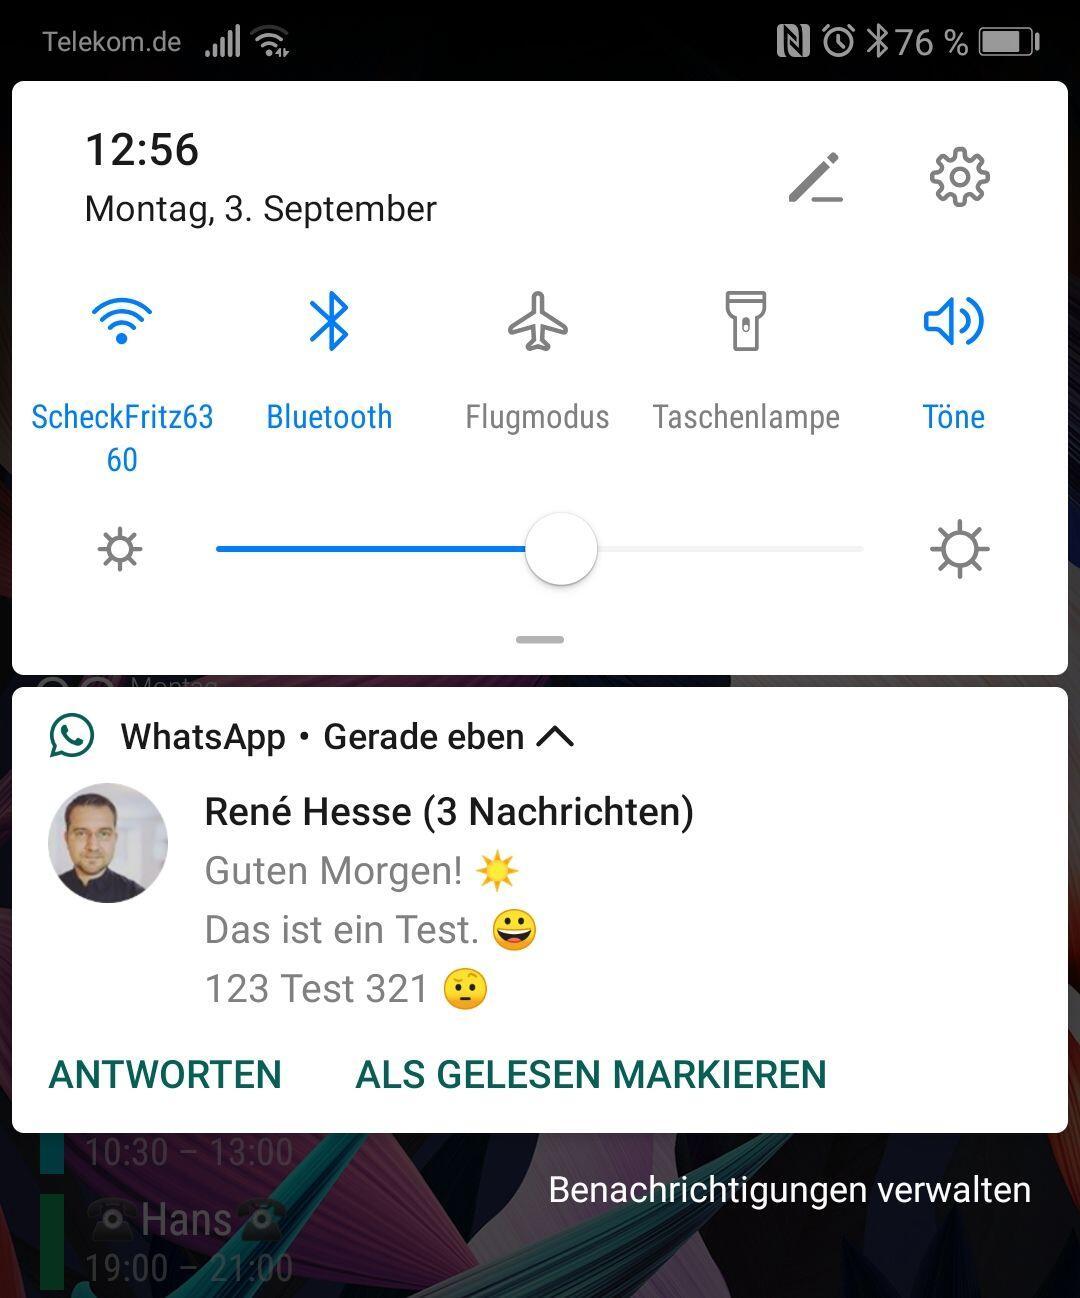 Huawei P20 Pro Android 9 Beta Notifications Whatsapp 2018 09 03 12.56.45